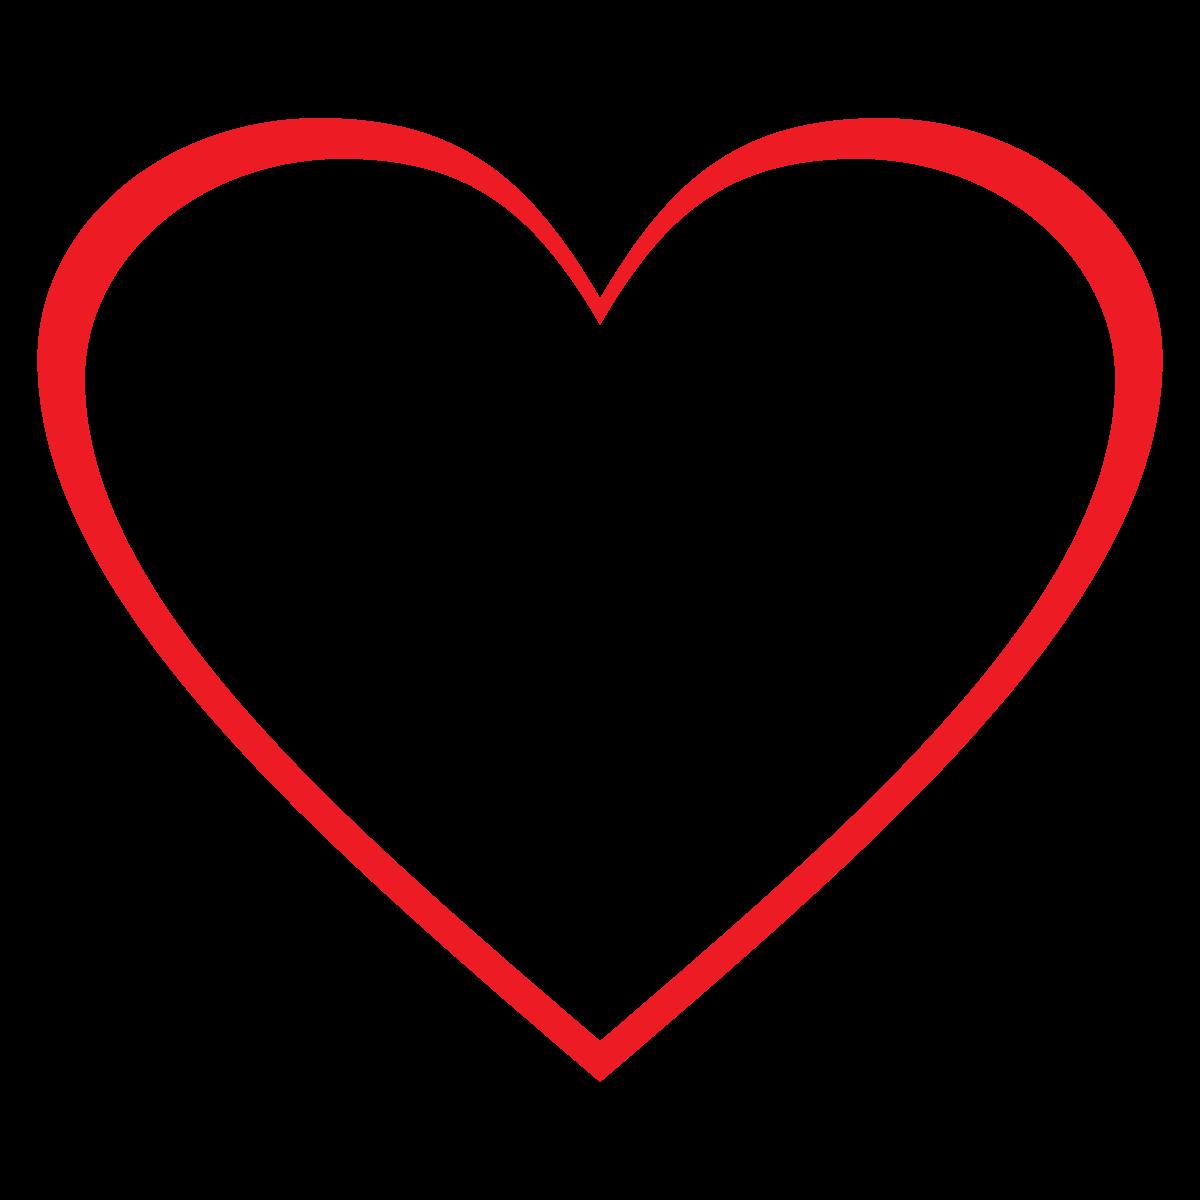 Heart clipart free clip art of hearts clipart clipart 2.